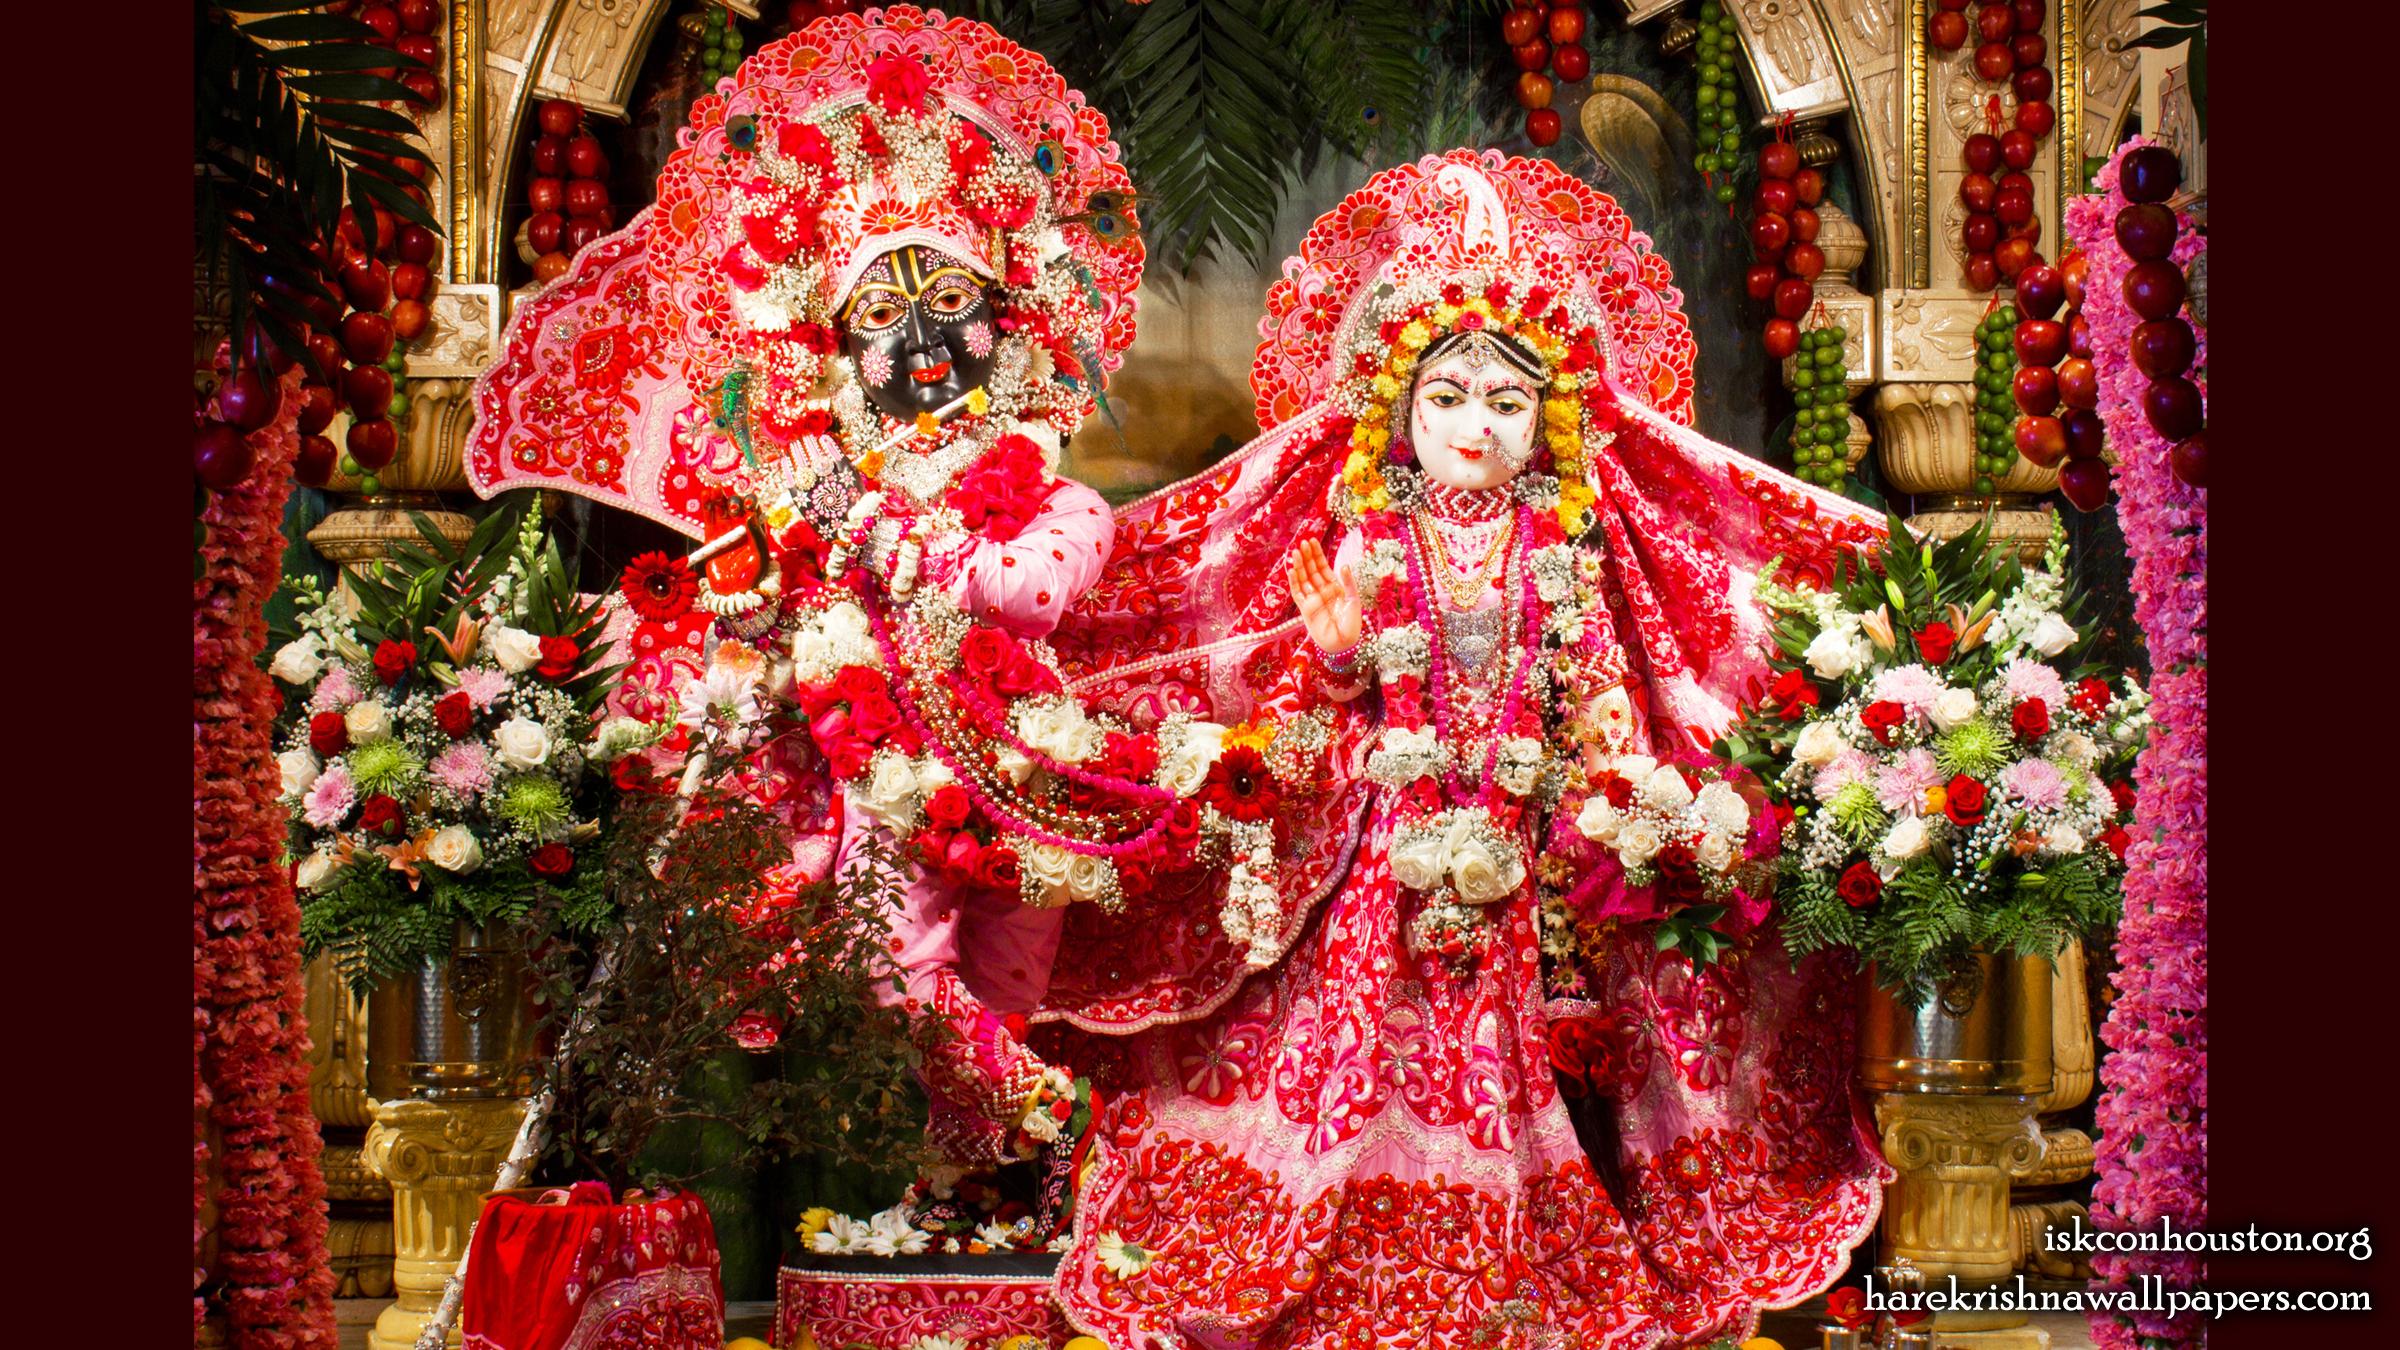 Sri Sri Radha Nilamadhava Wallpaper (011) Size 2400x1350 Download